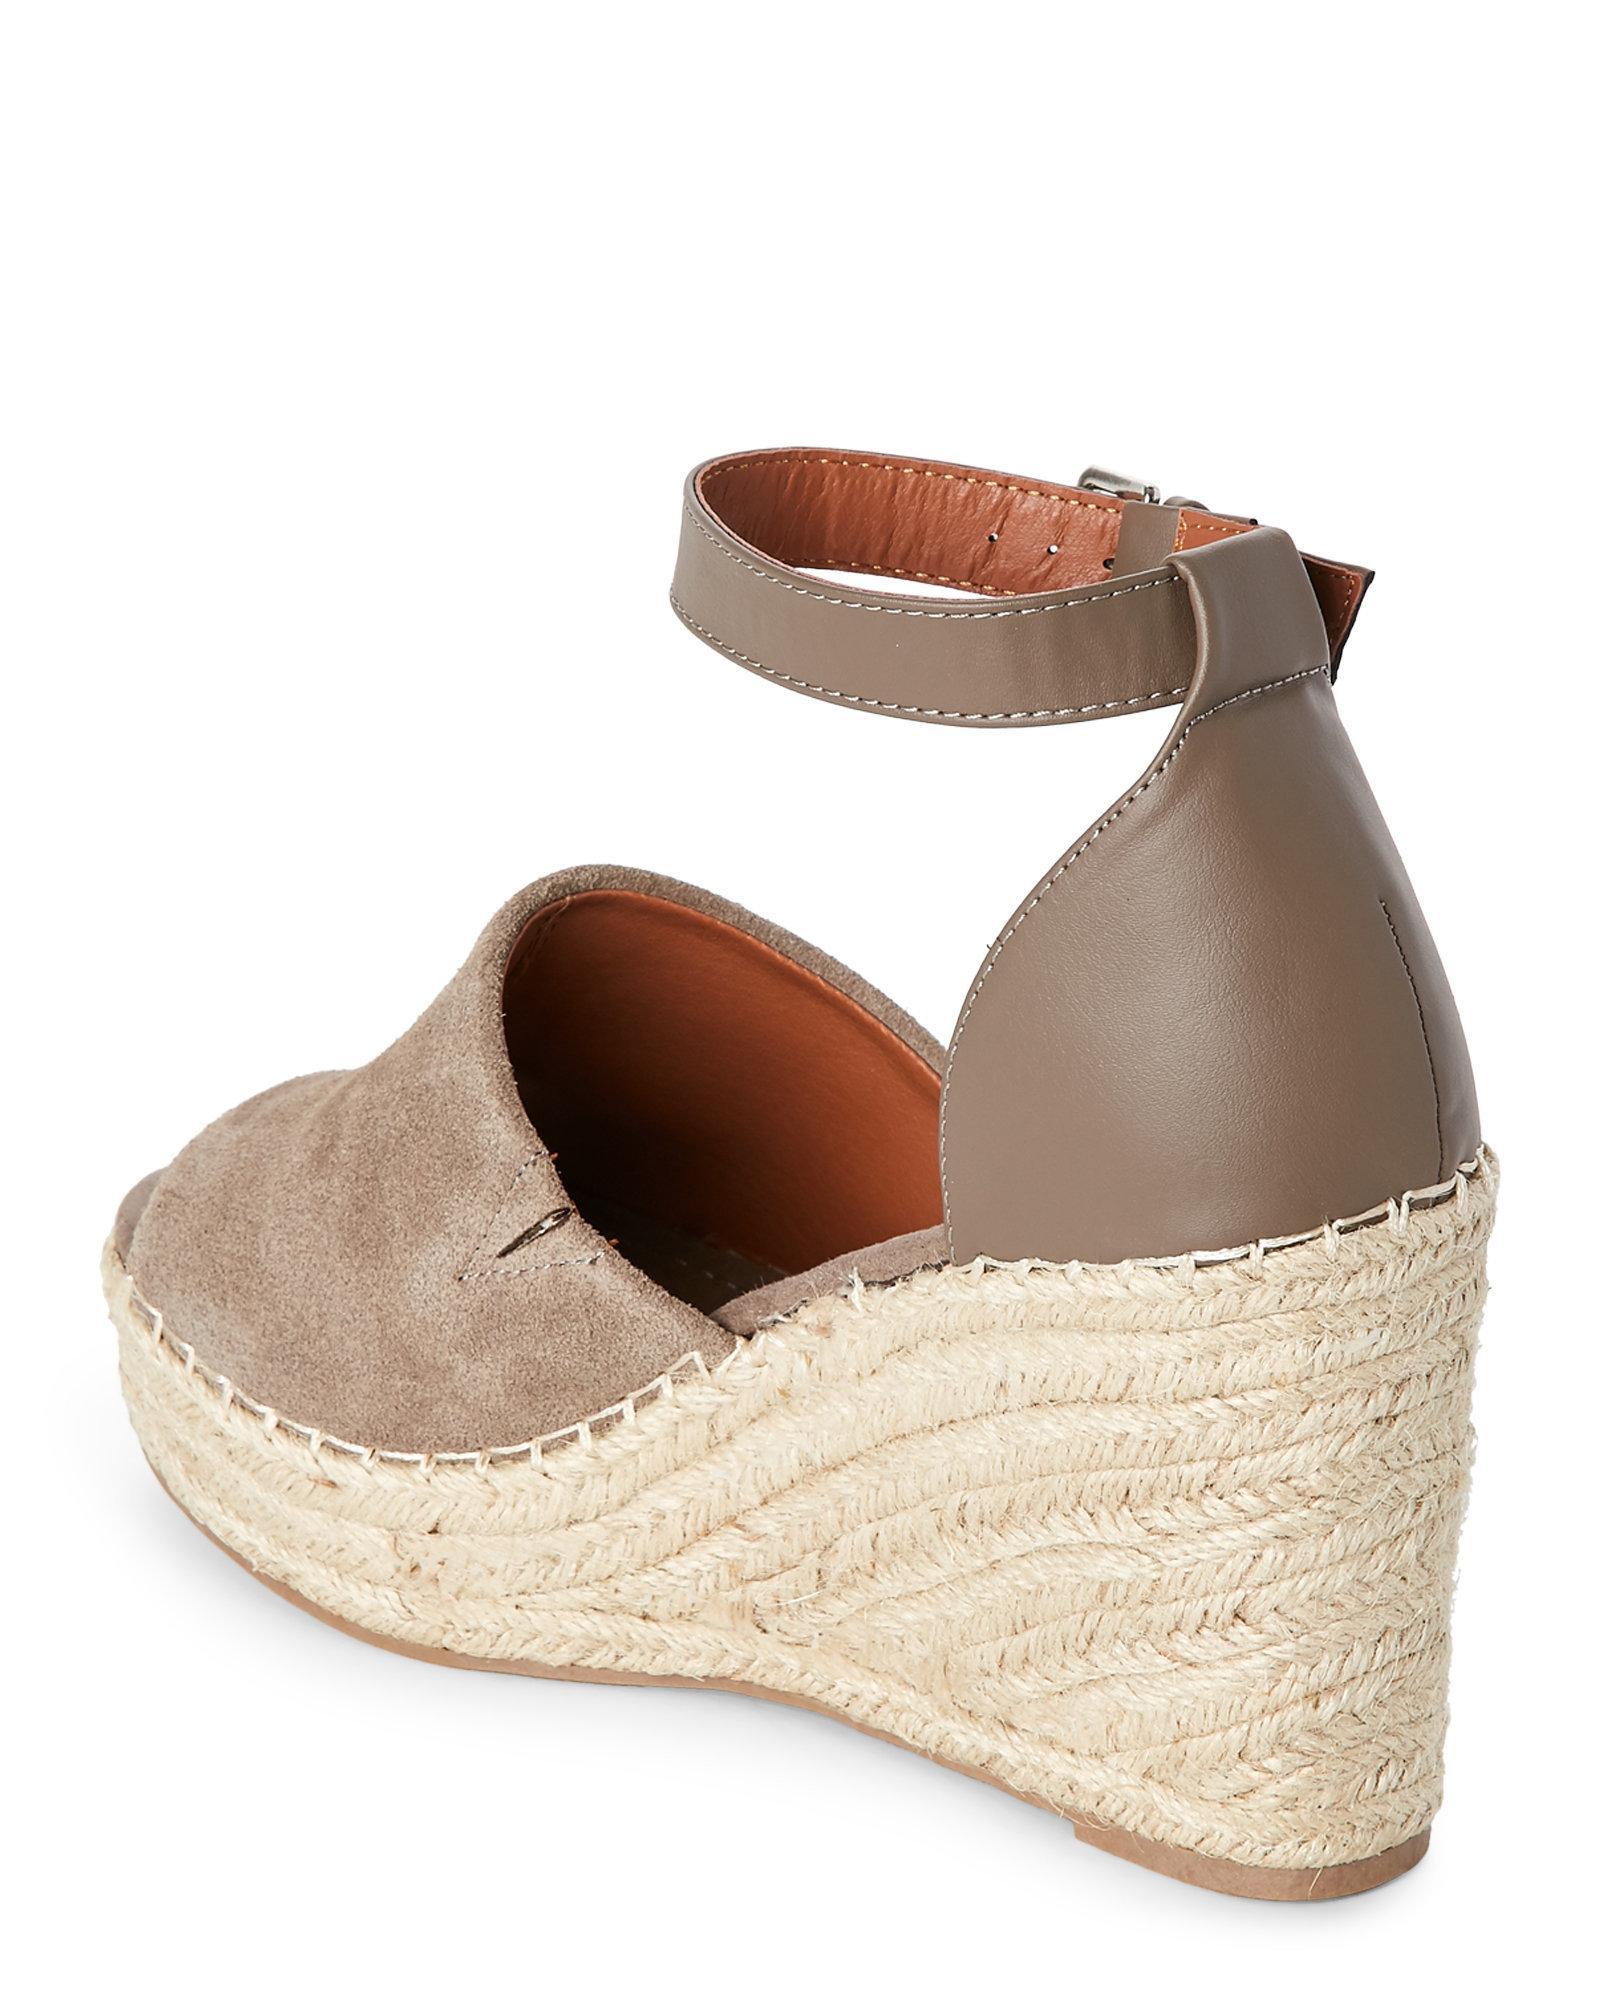 1979770251f Steve Madden Brown Taupe Jaylen Platform Wedge Espadrille Sandals